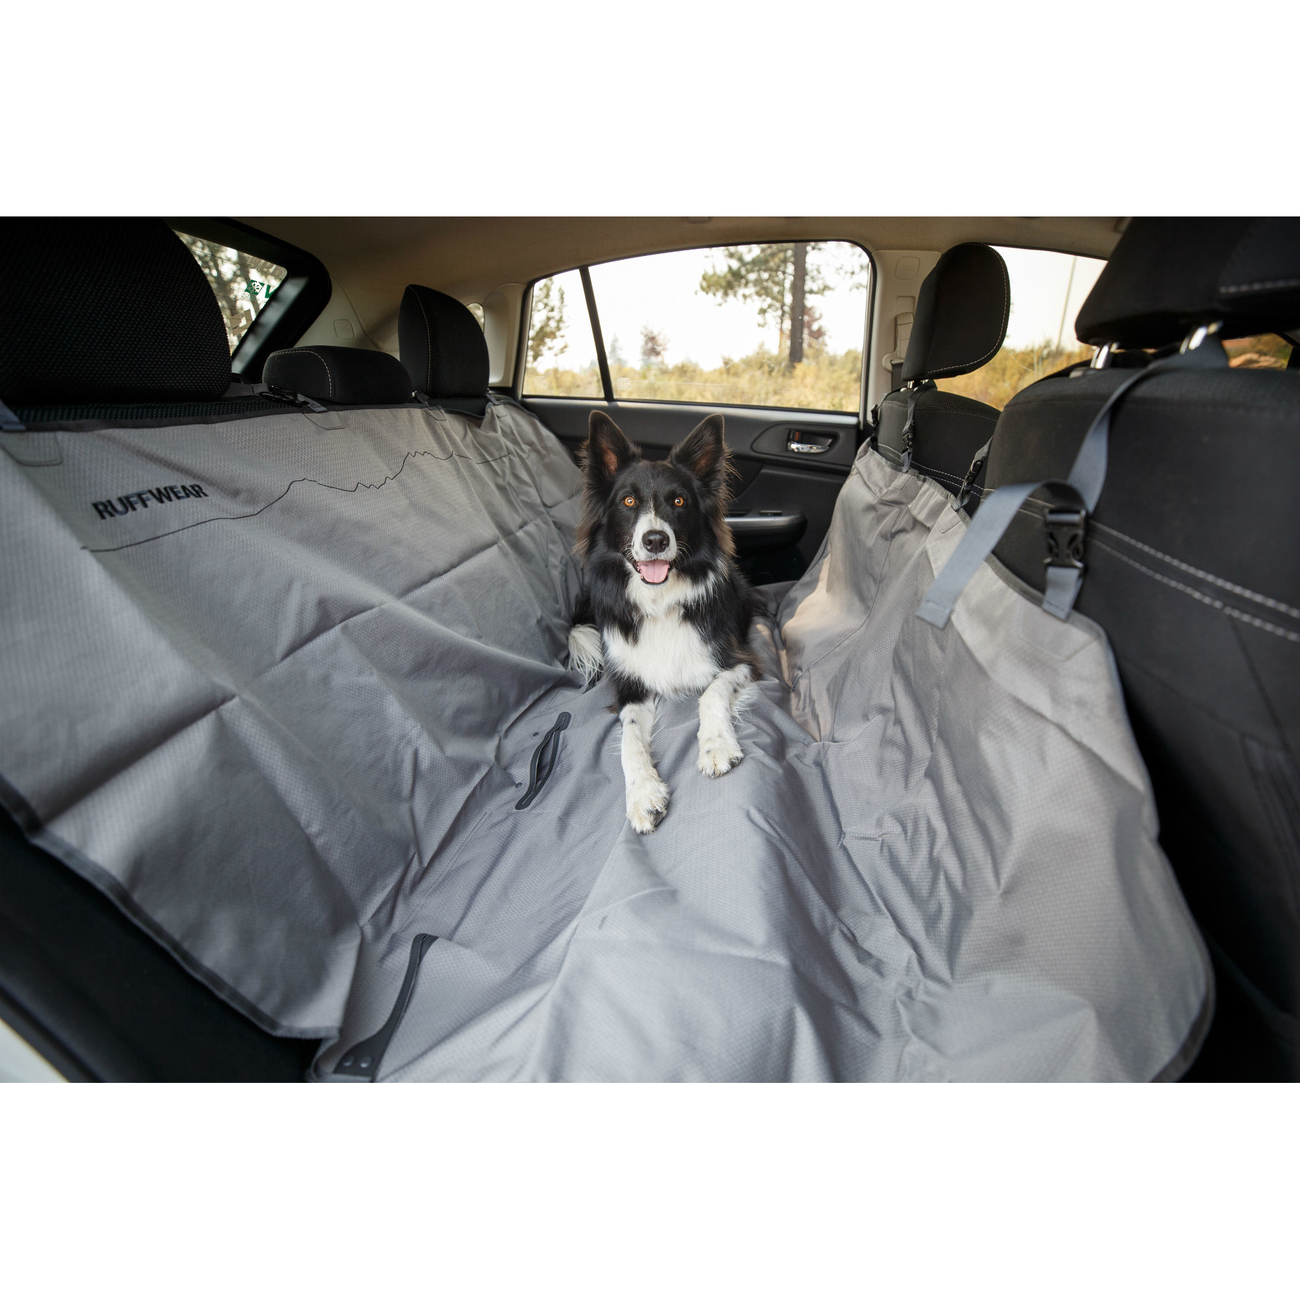 Ruffwear Dirtbag Seat Cover Autoschutzdecke, Bild 2